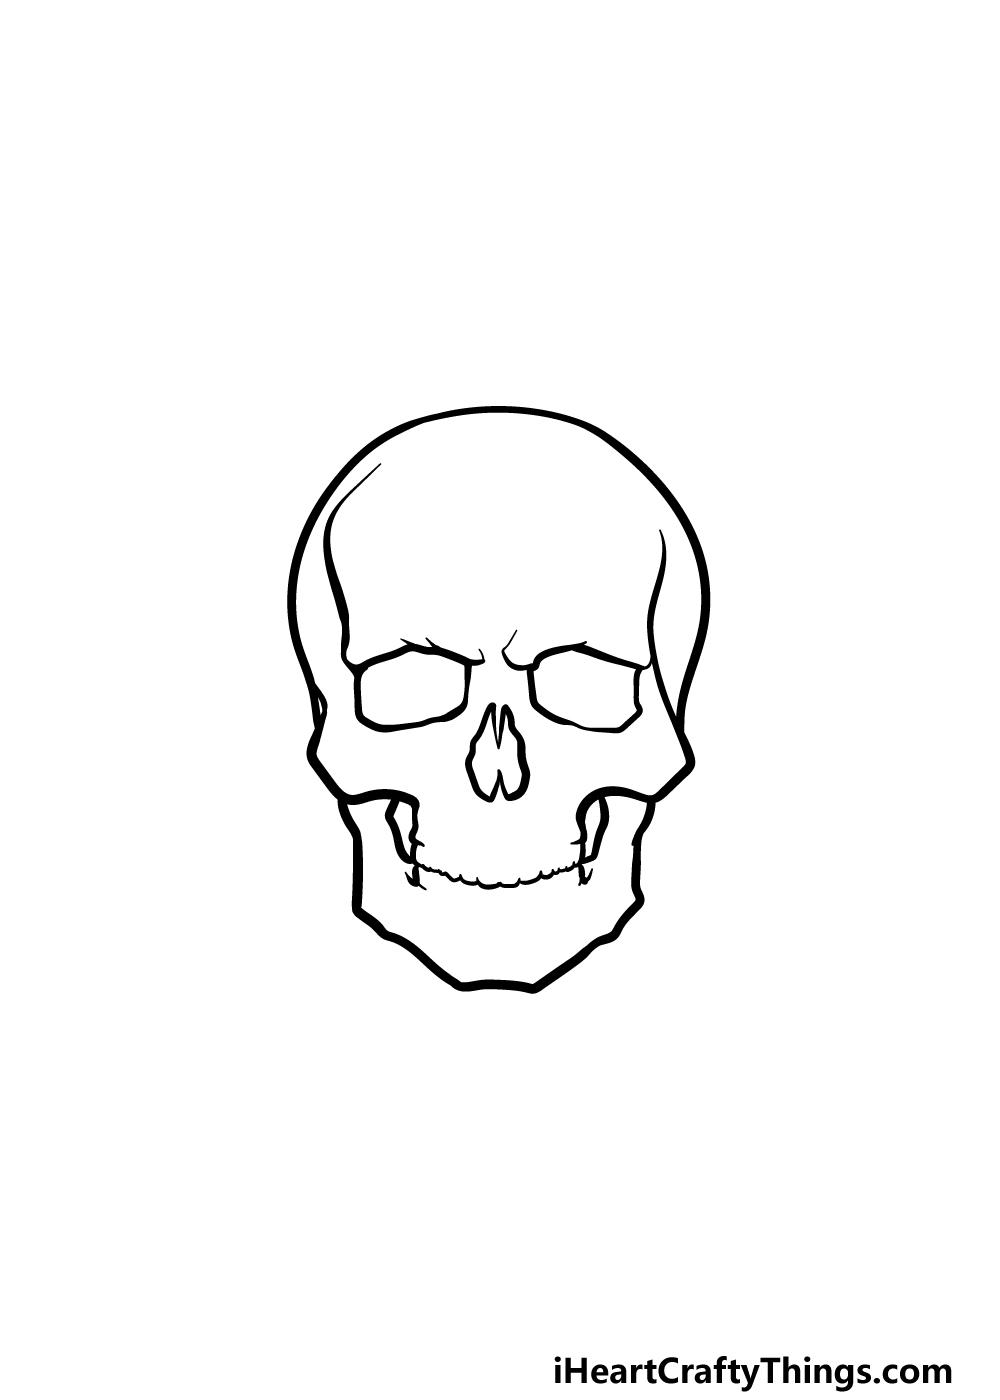 drawing a skeleton head step 2